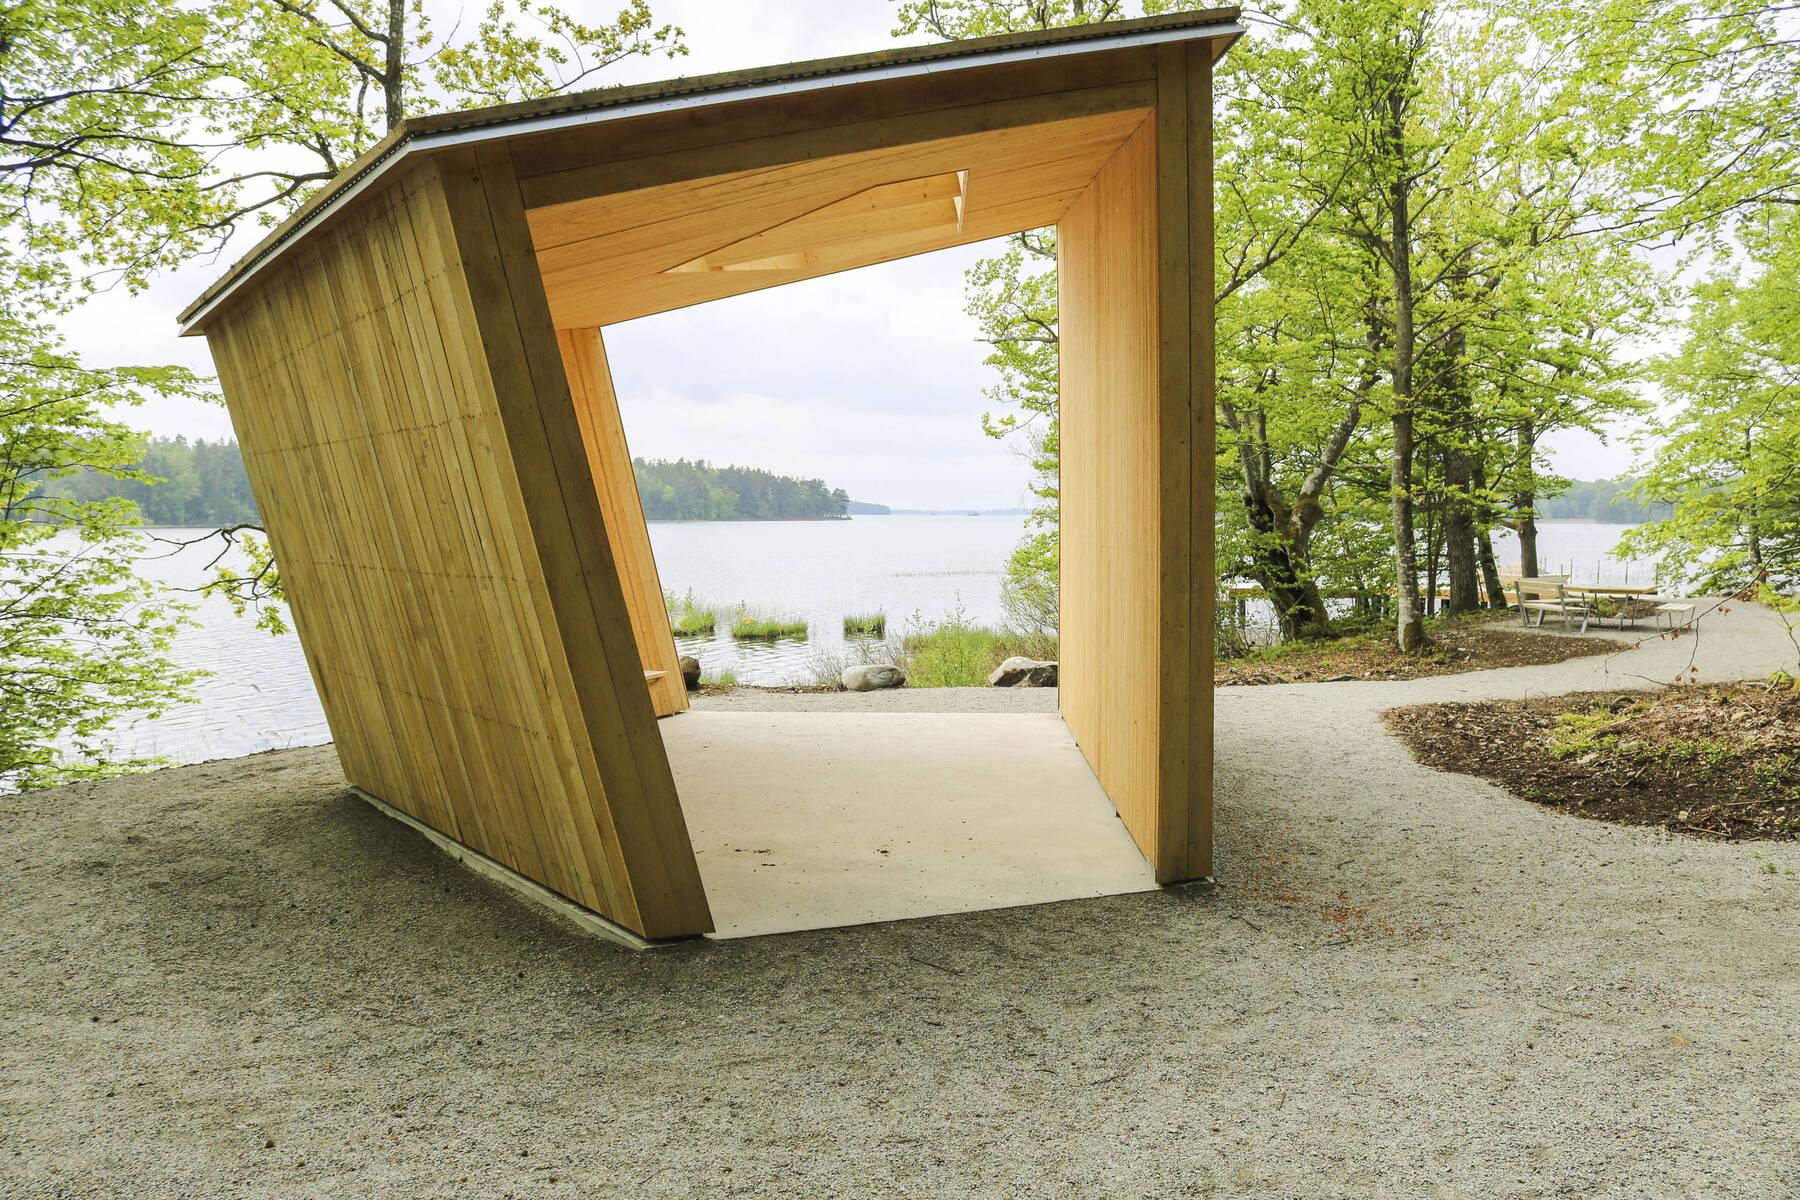 Sunnabron - Nationalpark Åsnen